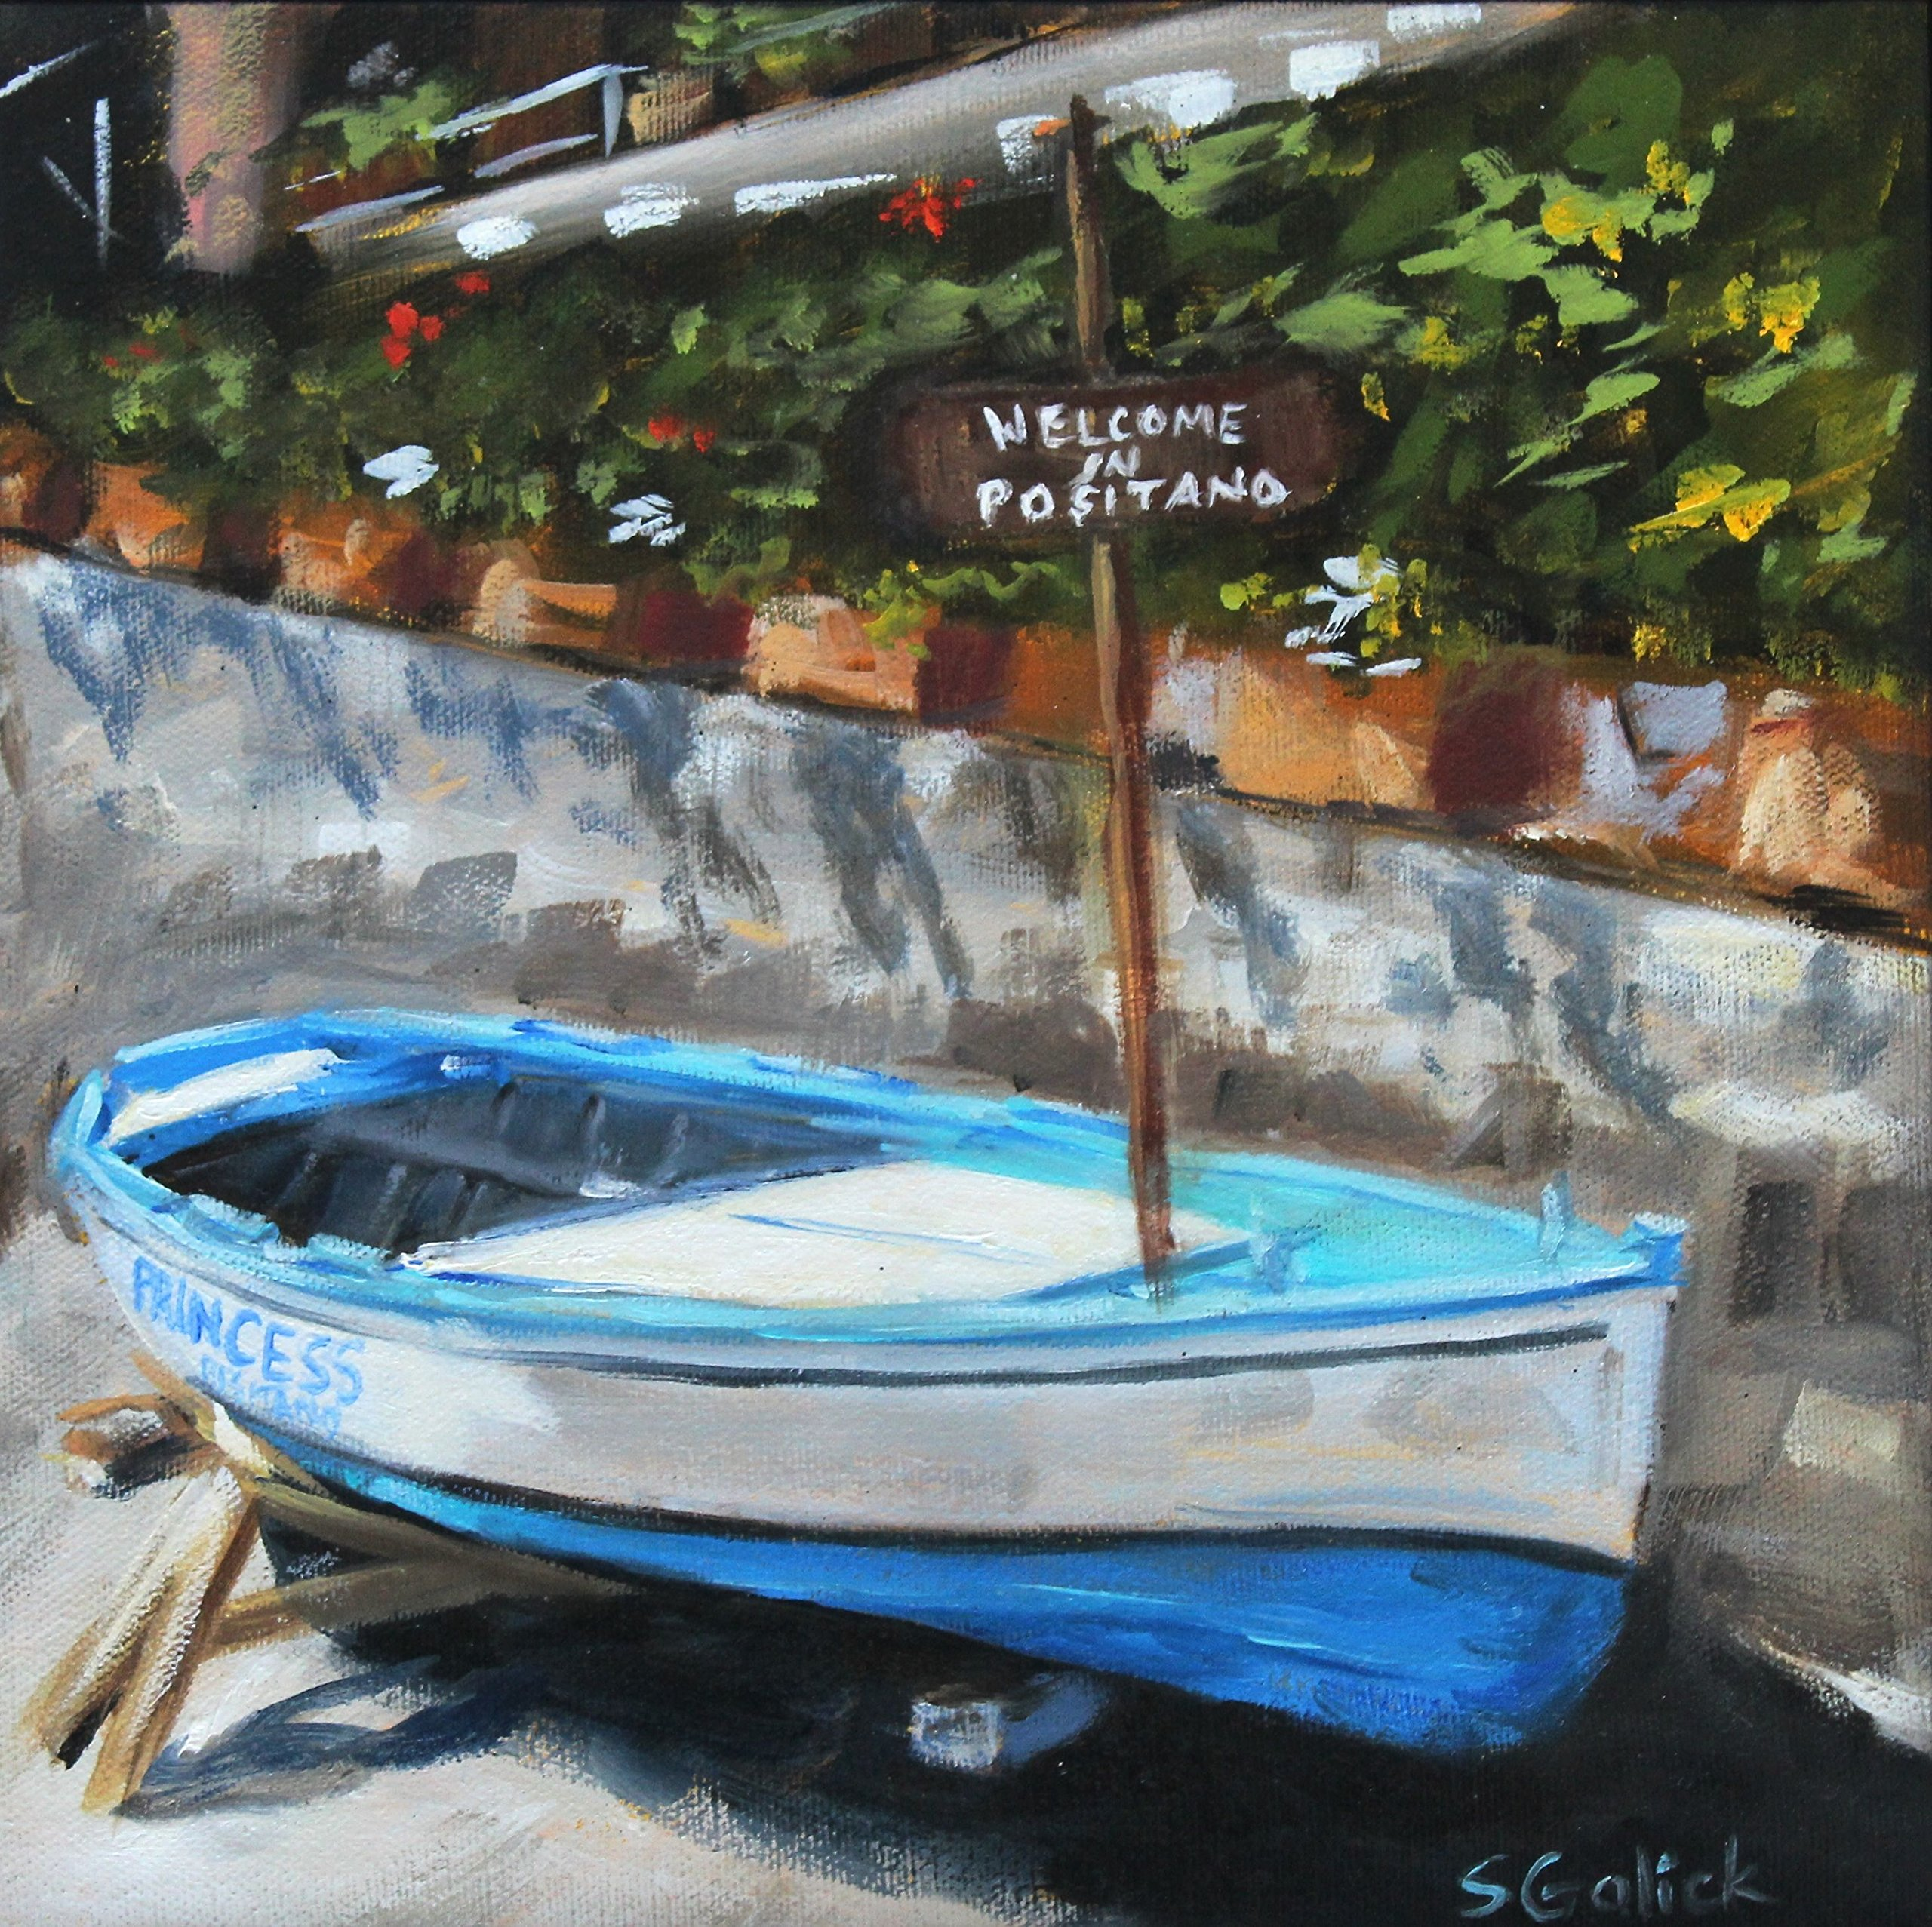 Positano Rowboat by